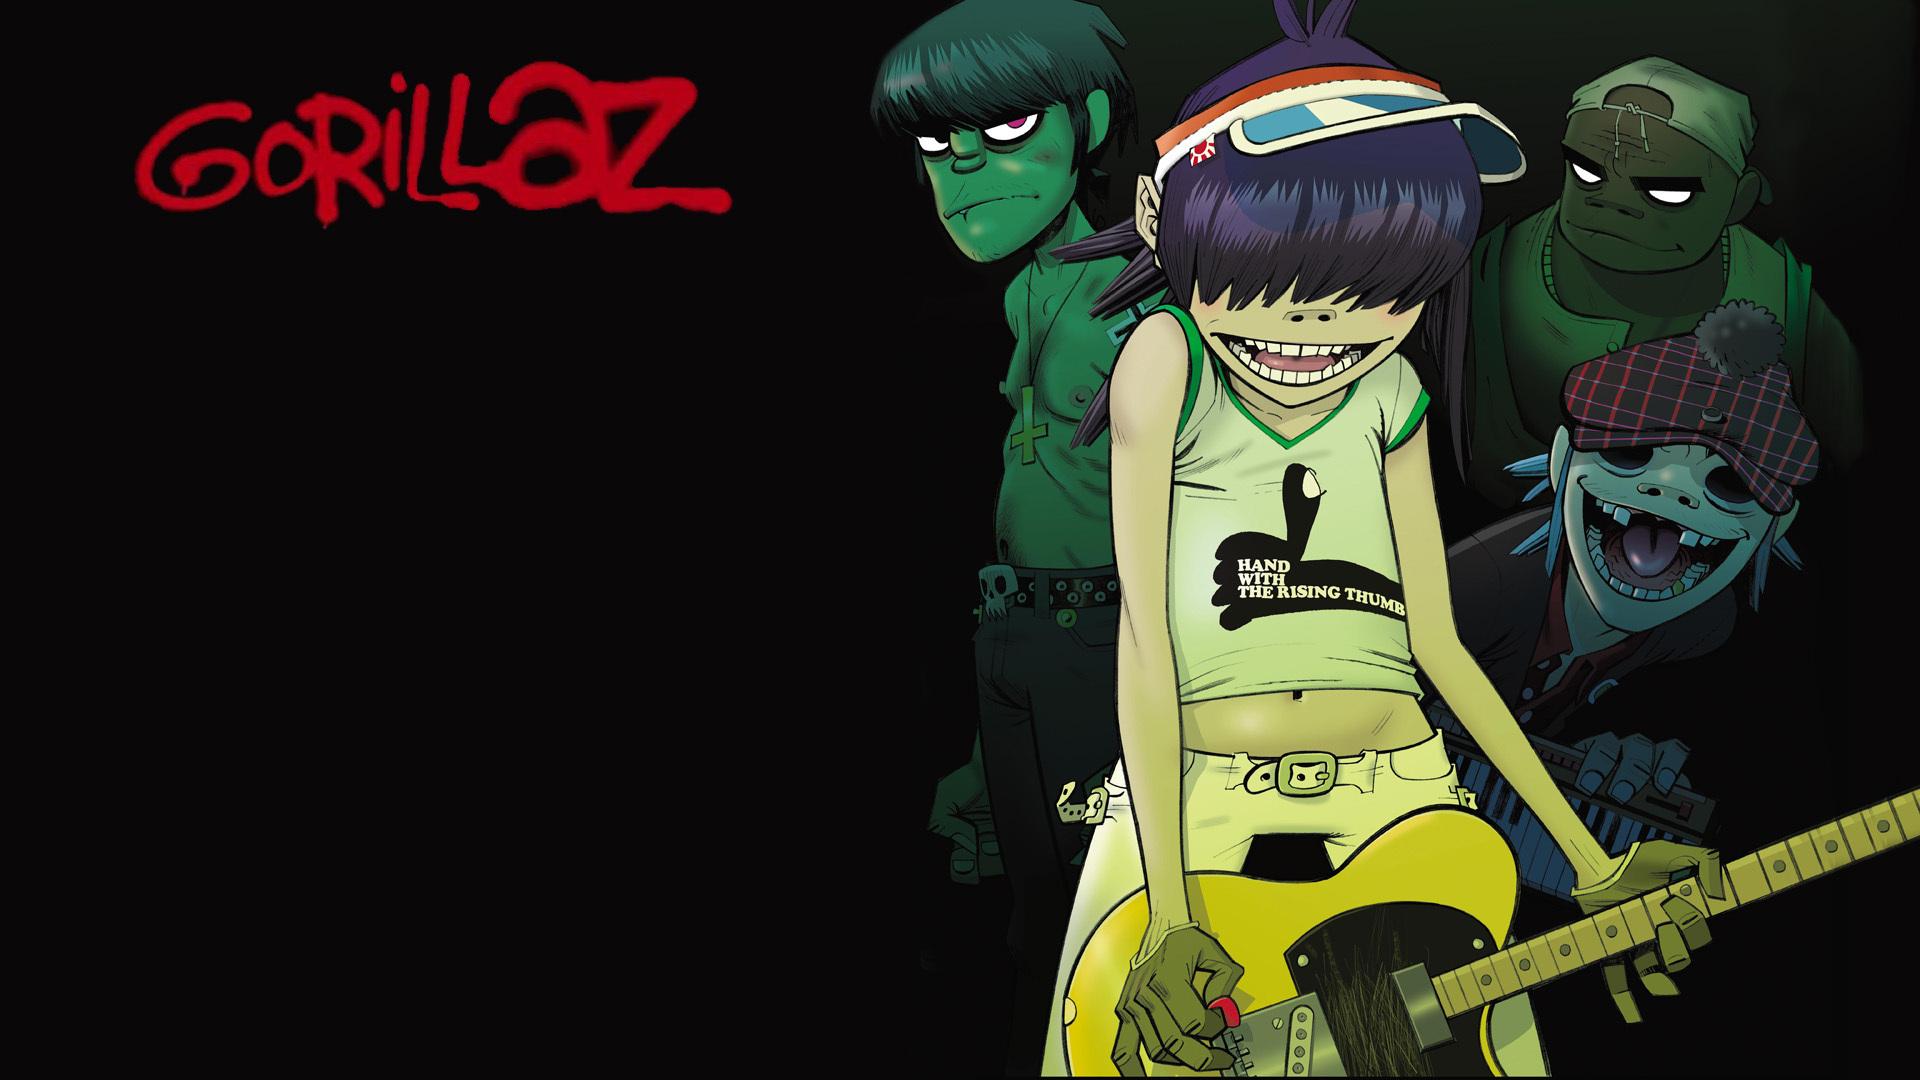 Gorillaz · Gorillaz · Gorillaz · Gorillaz ...